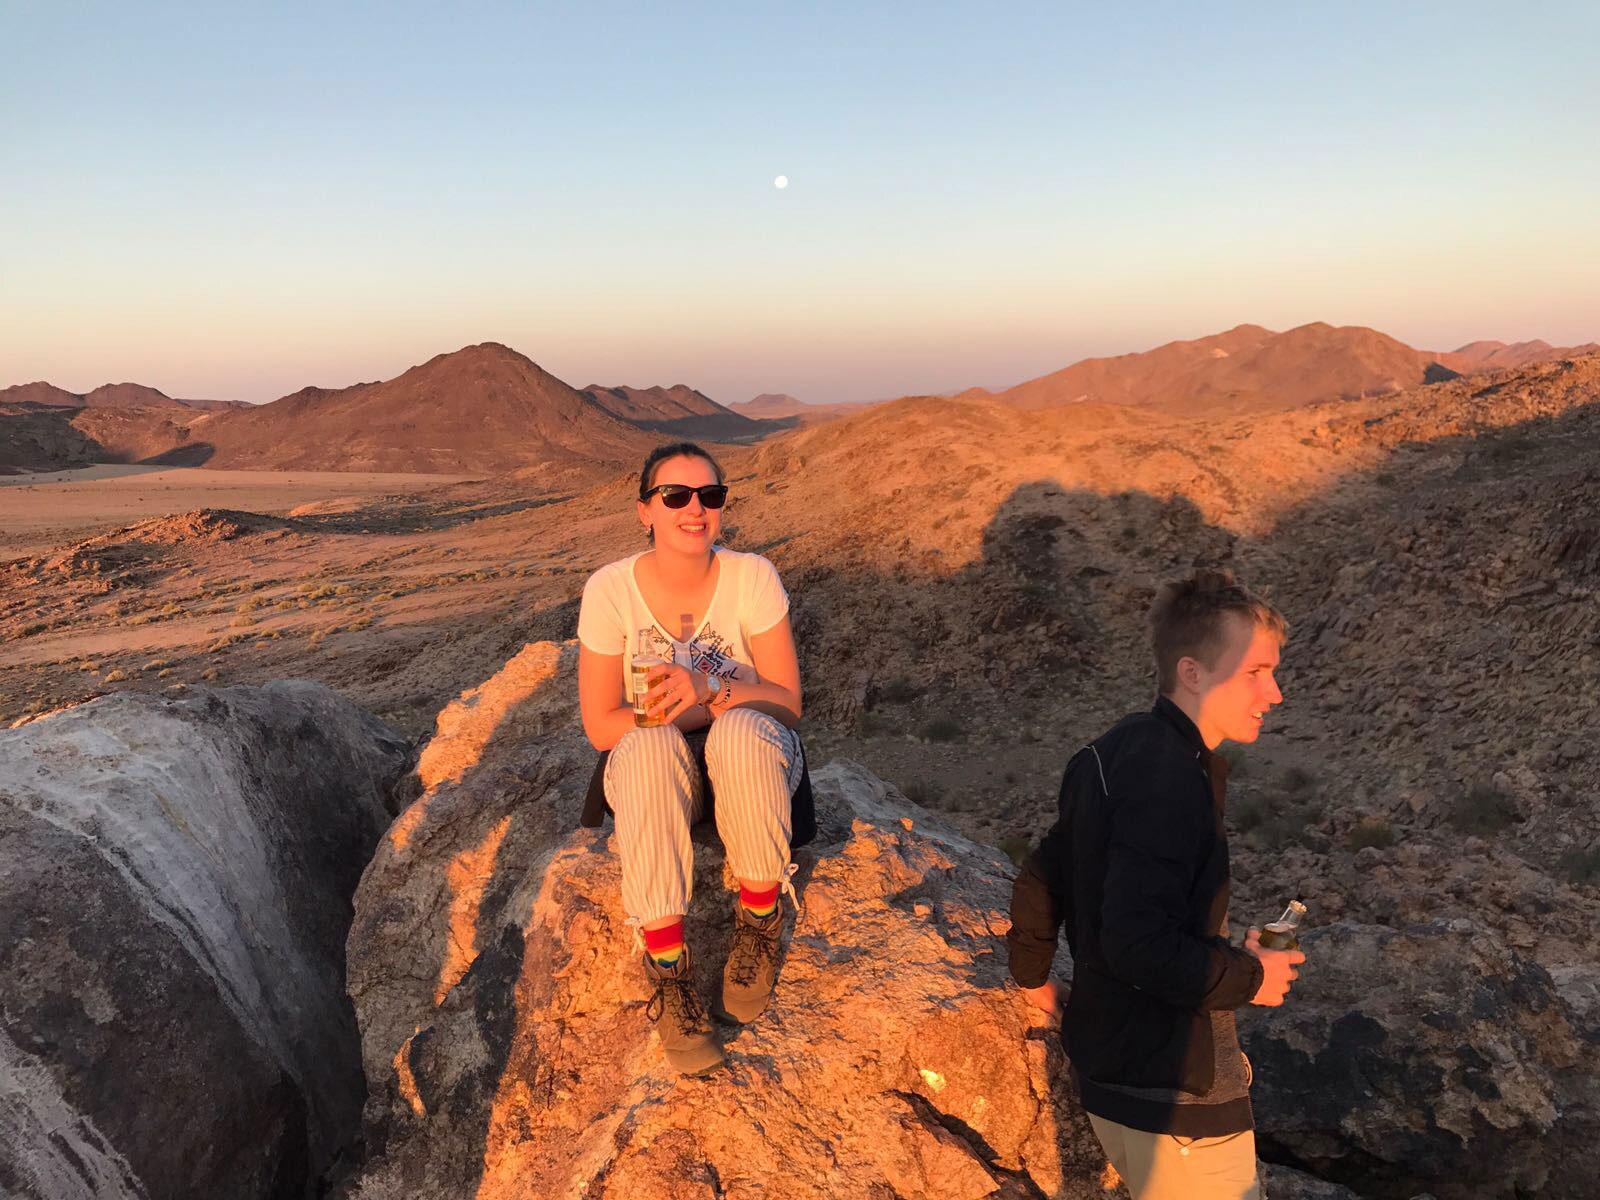 Willa-Prest-in Namibia